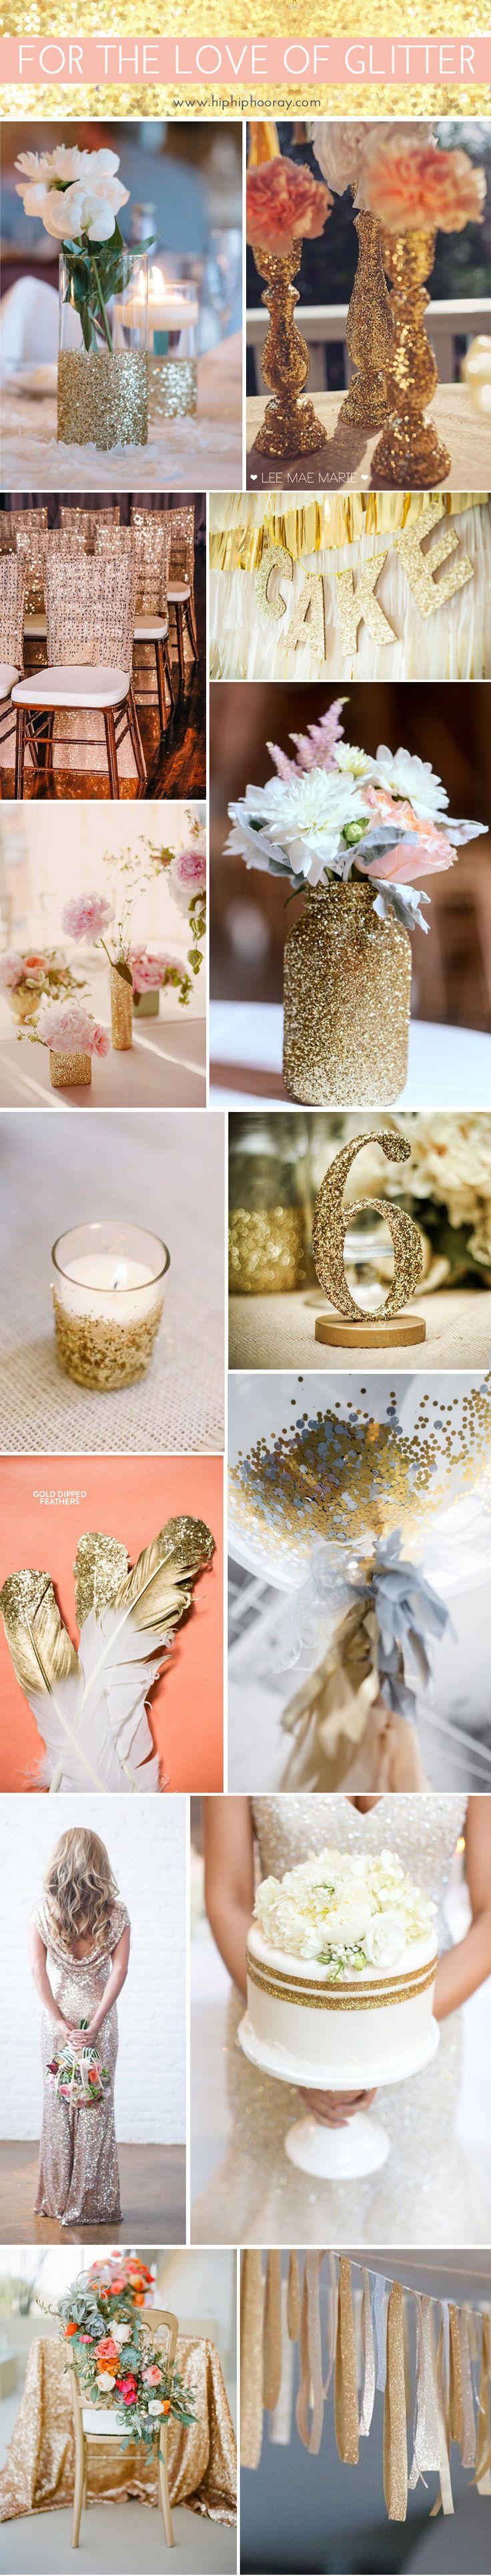 30 best Something Sweet images on Pinterest